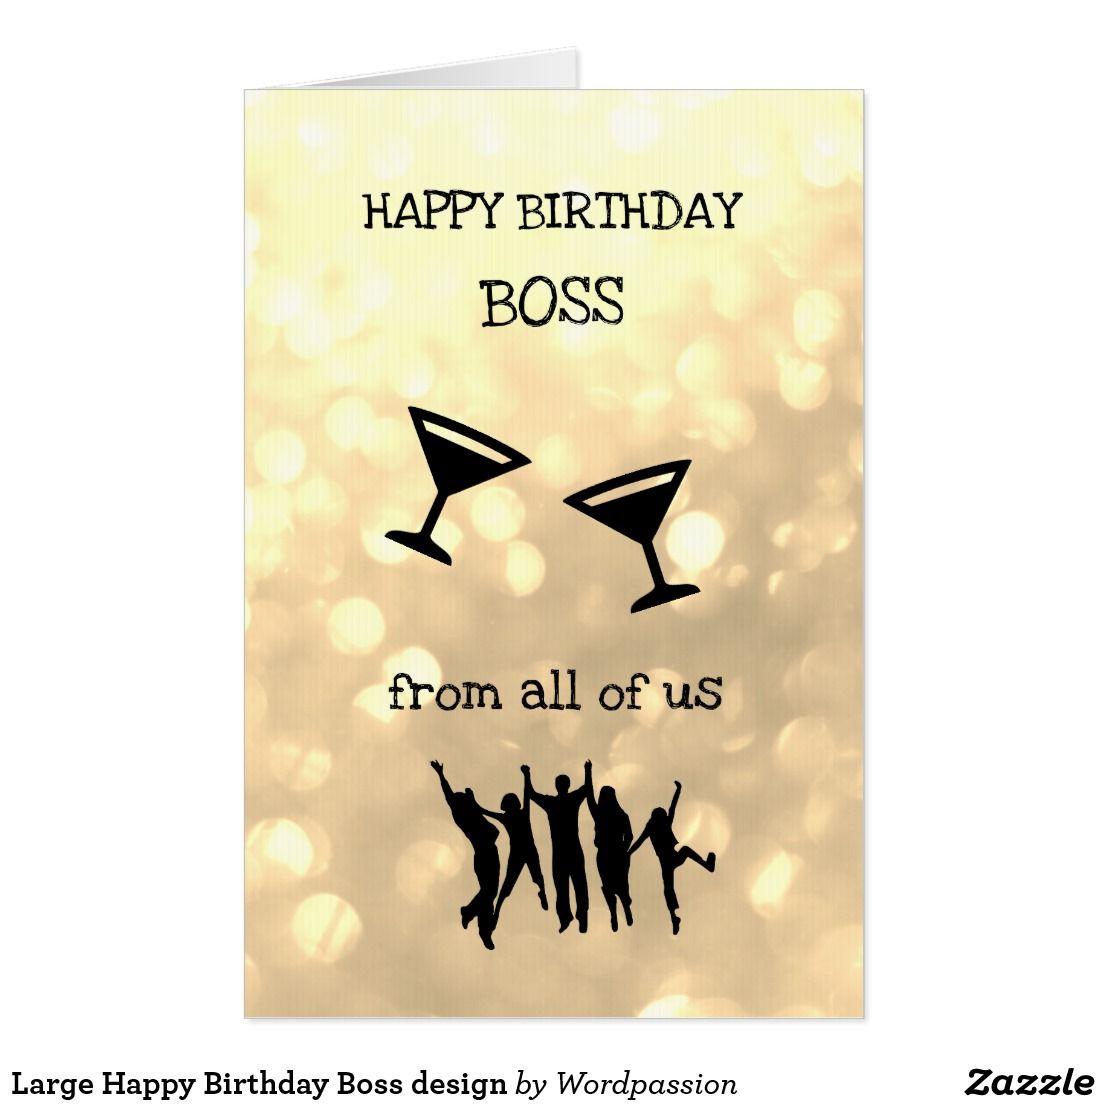 Large Happy Birthday Boss Design